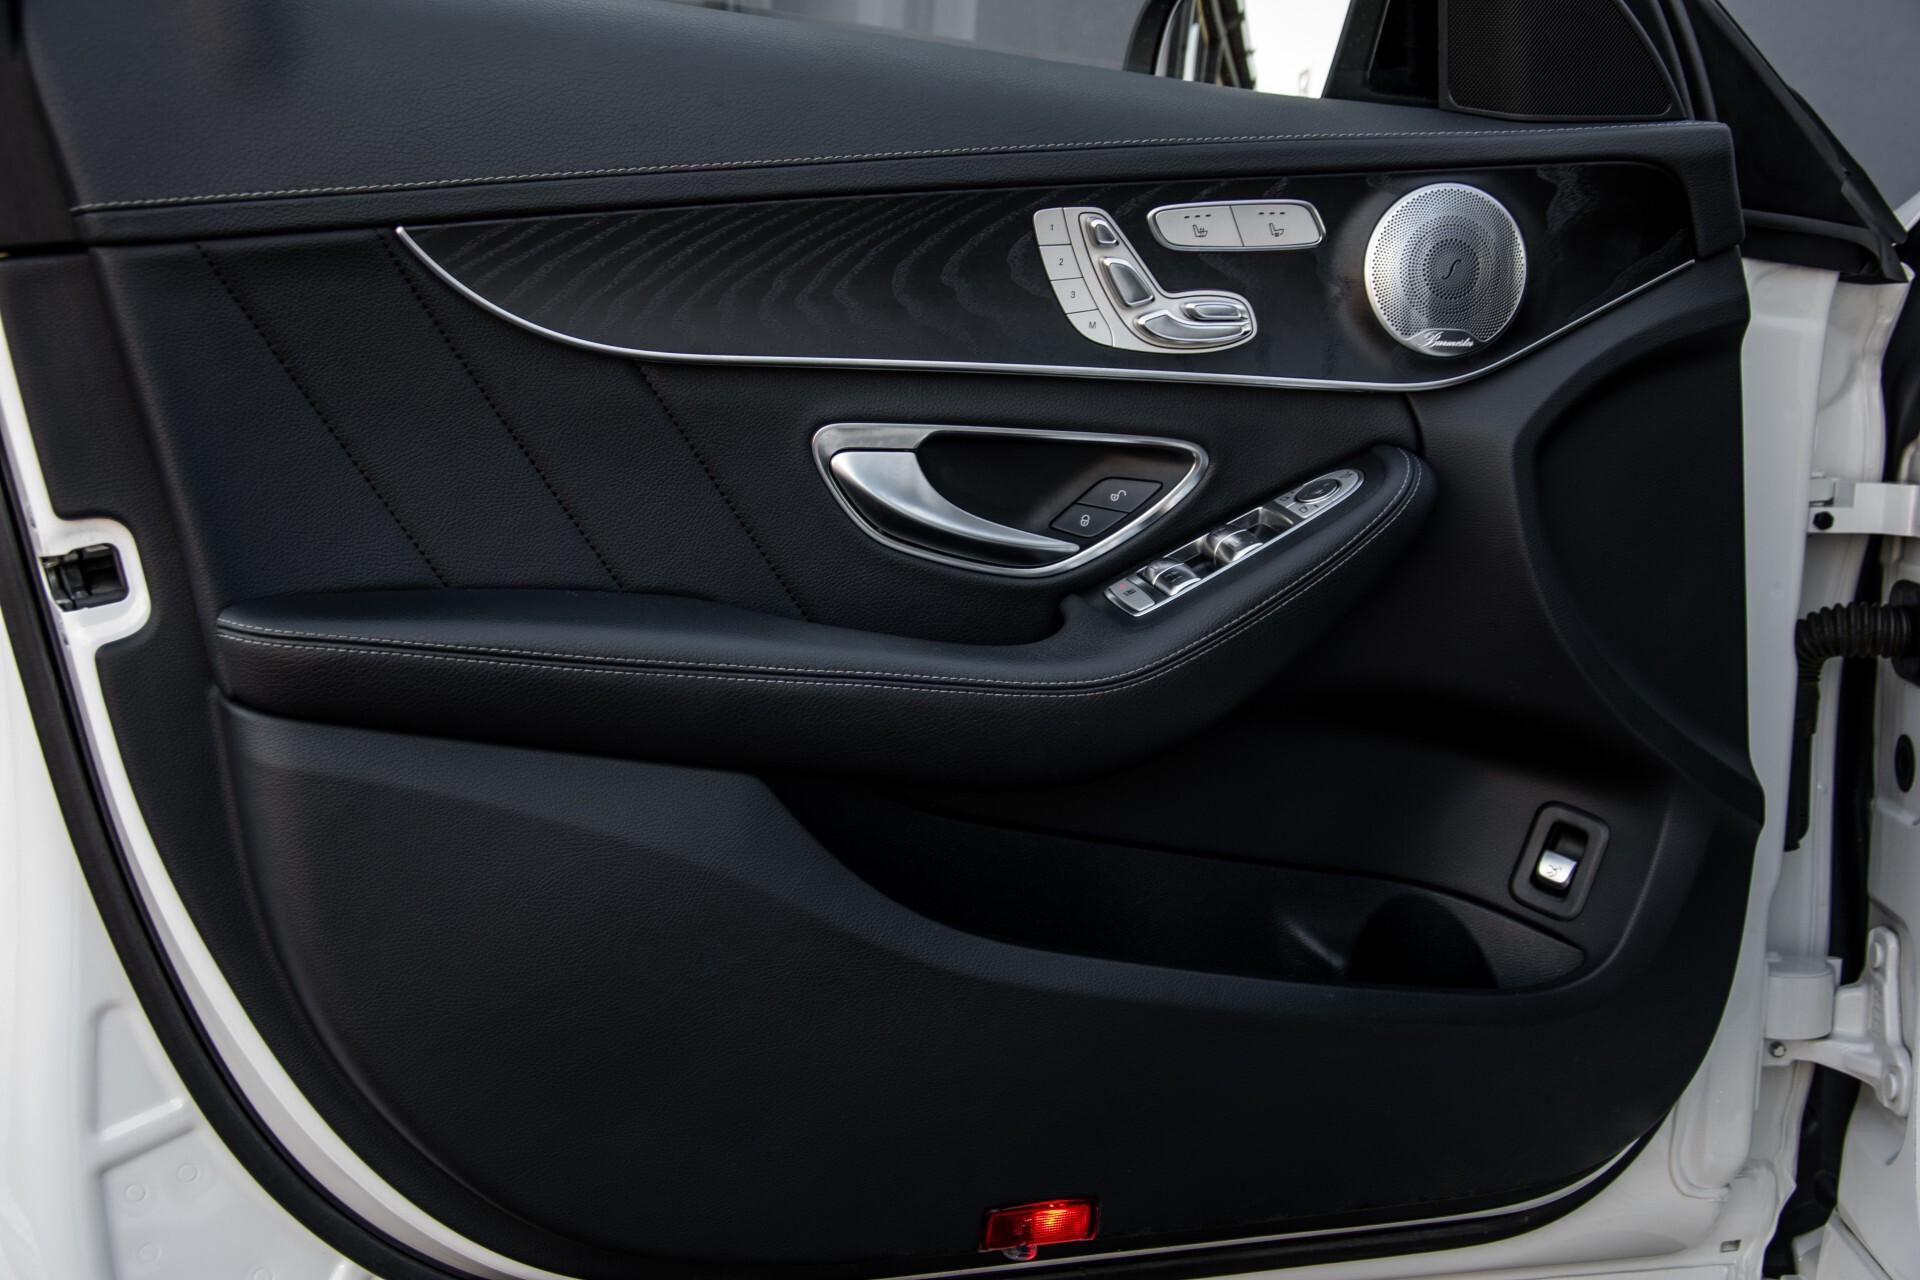 Mercedes-Benz C-Klasse 450/43 AMG 4-M Distronic/Standkachel/Panorama/Keyless/Harman-Kardon/Stoelkoeling Aut7 Foto 24